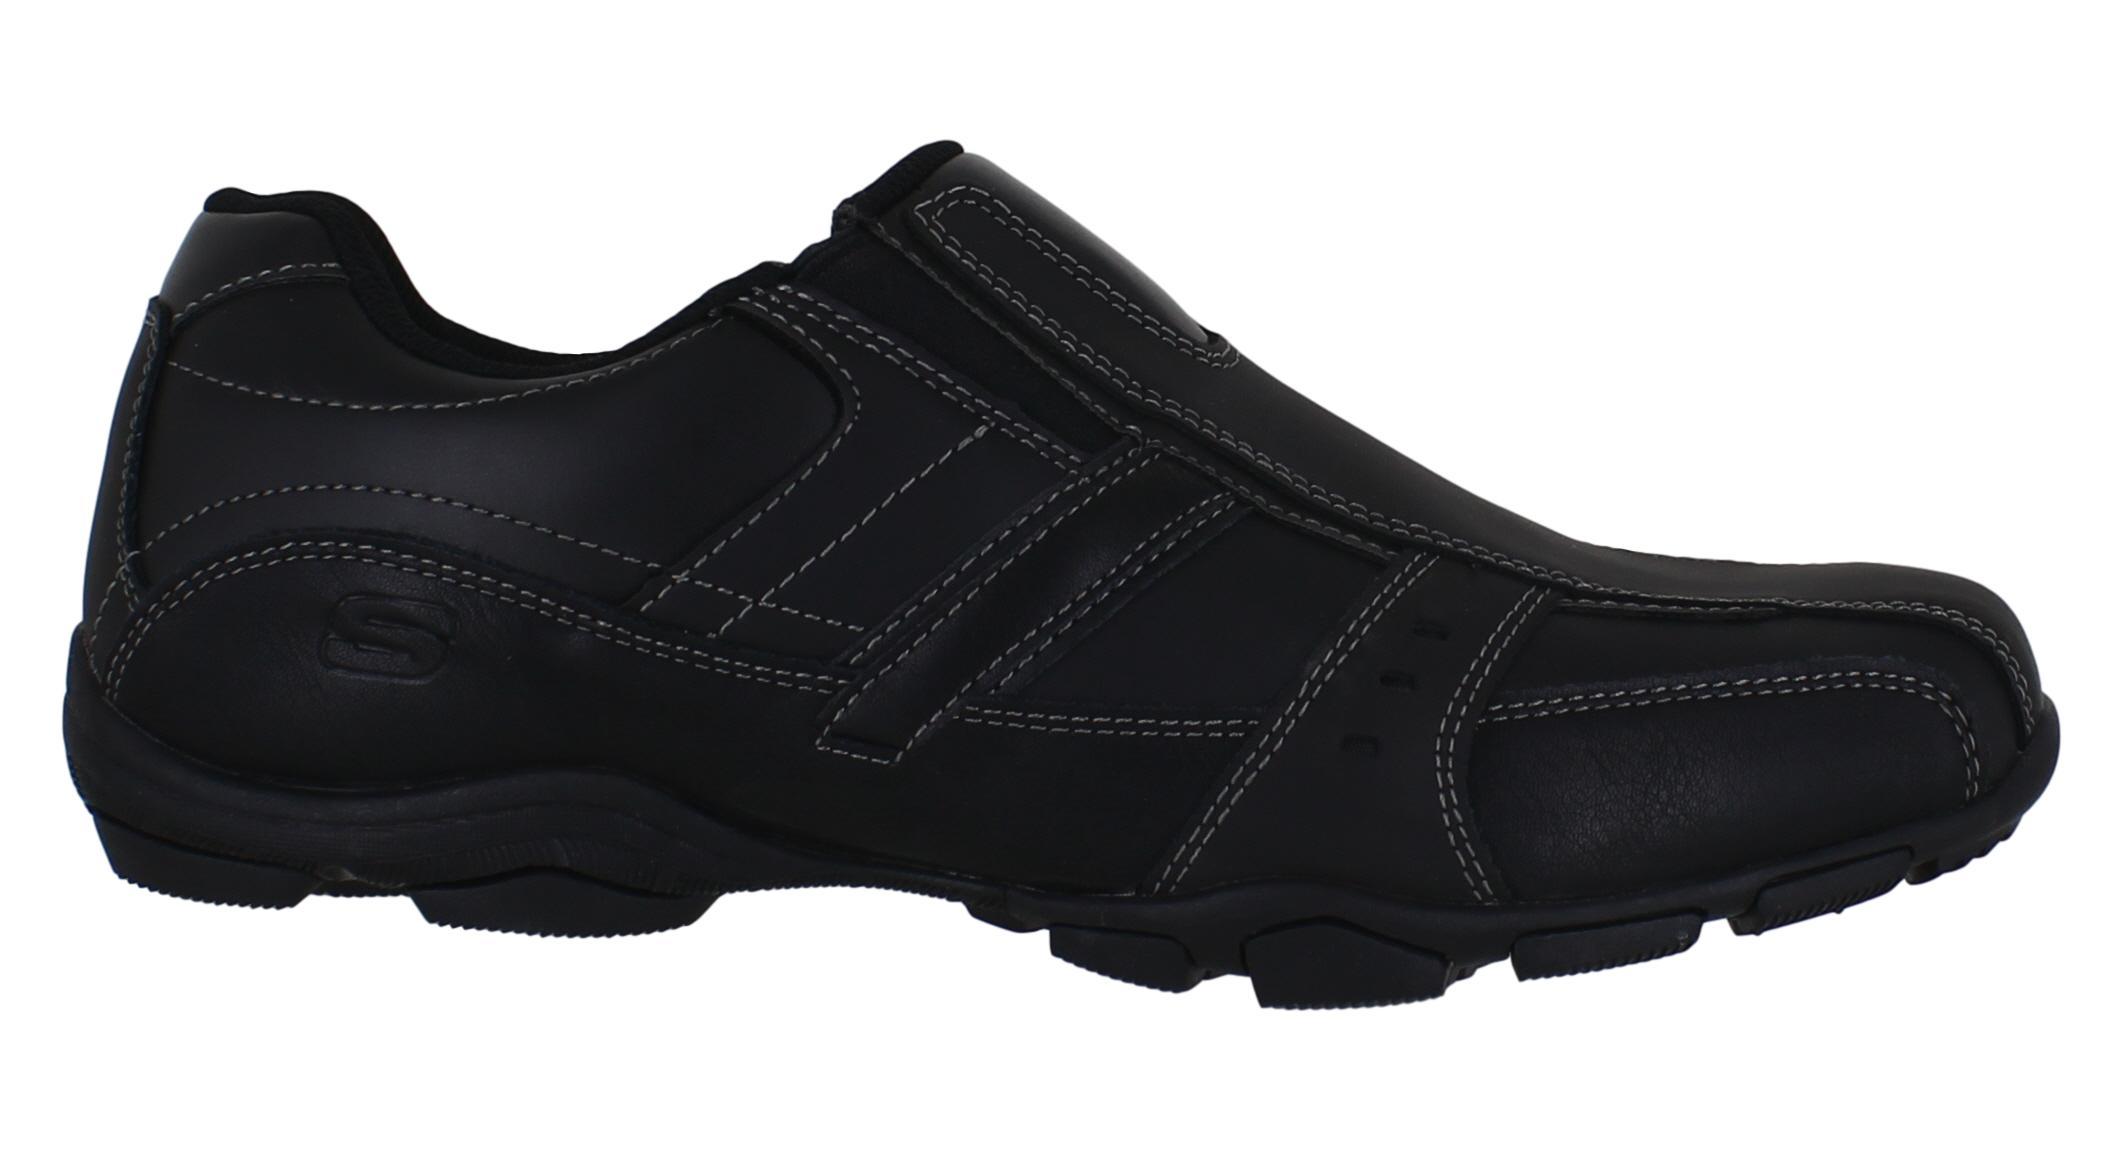 Mens Skechers Marter Kool Digz Casual Smart Leather Slip